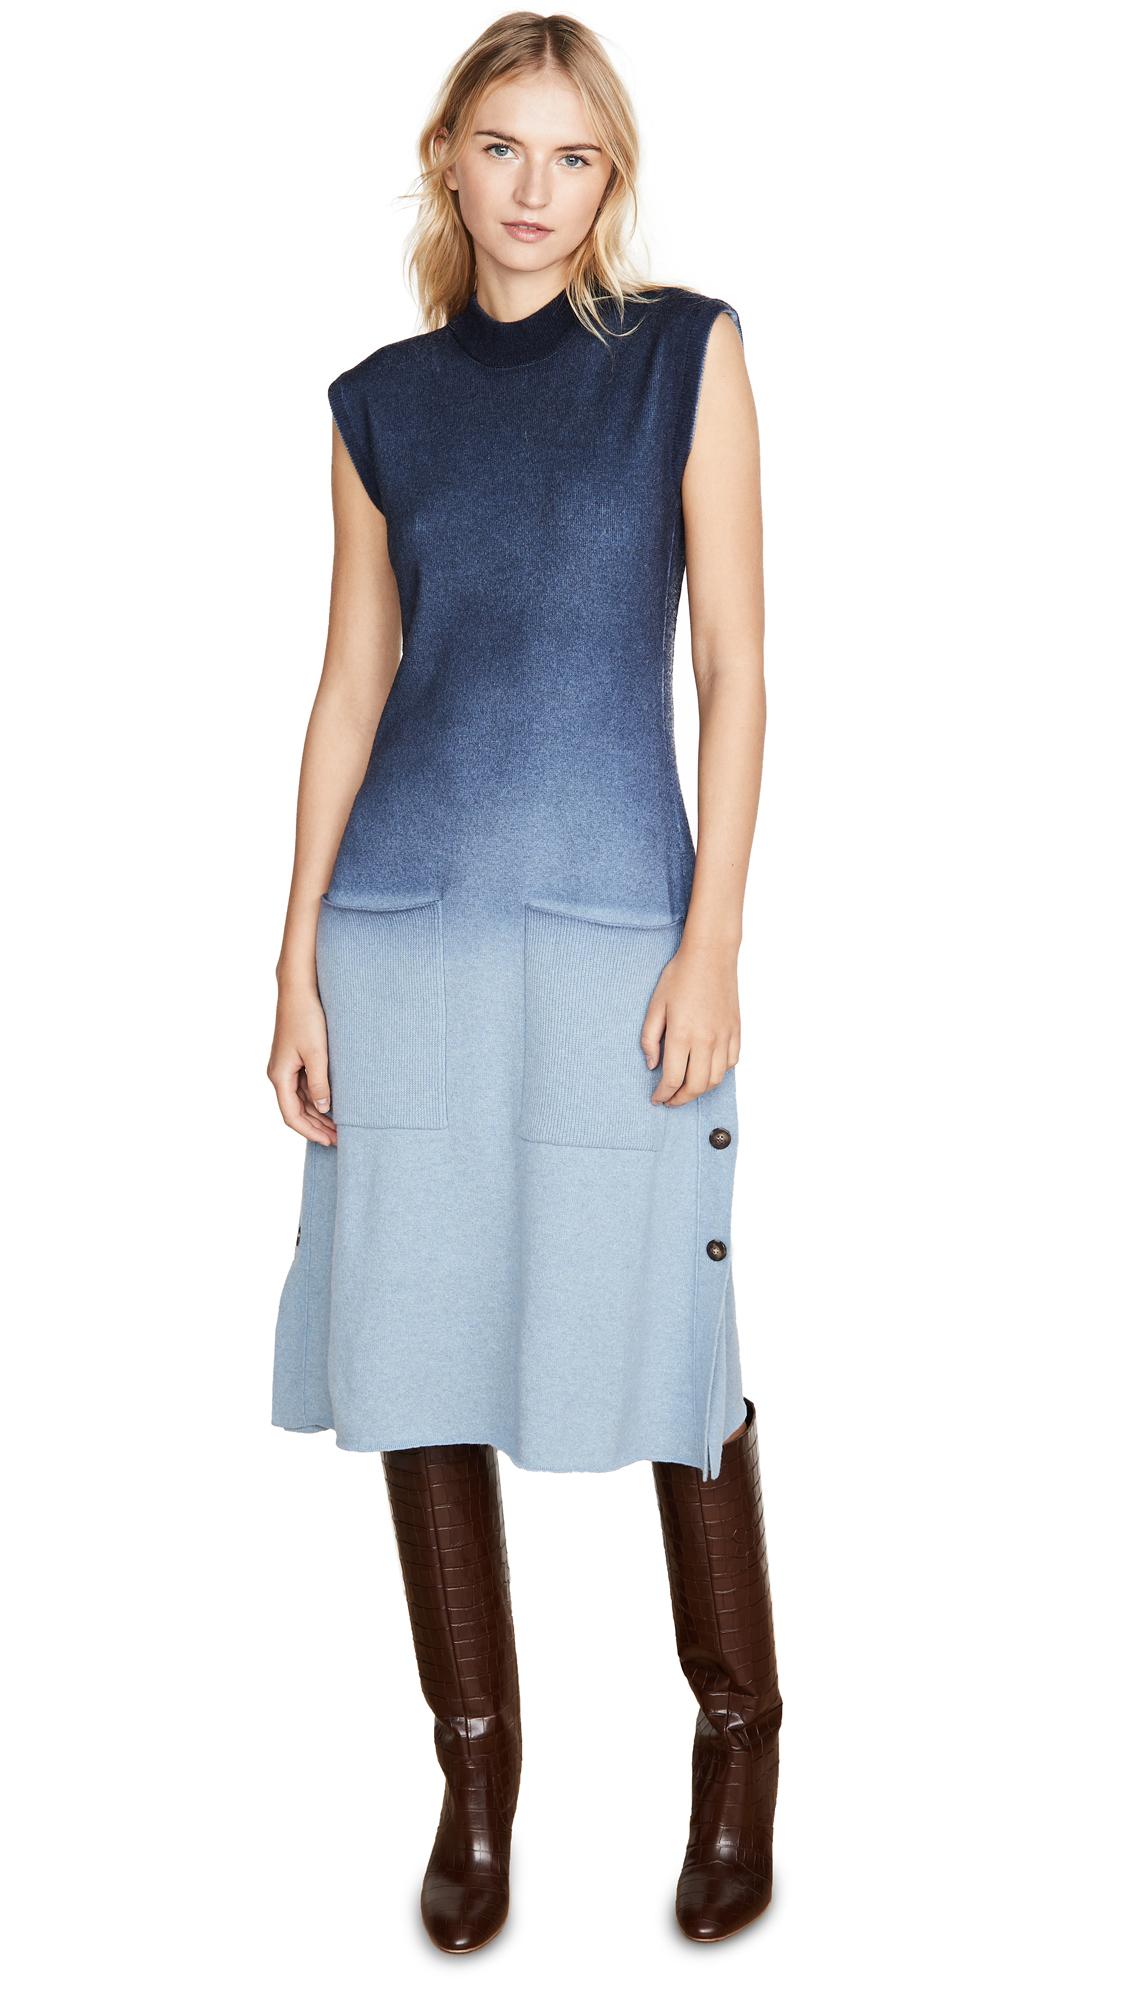 Cedric Charlier Blue Ombre Sweater Dress - Blue